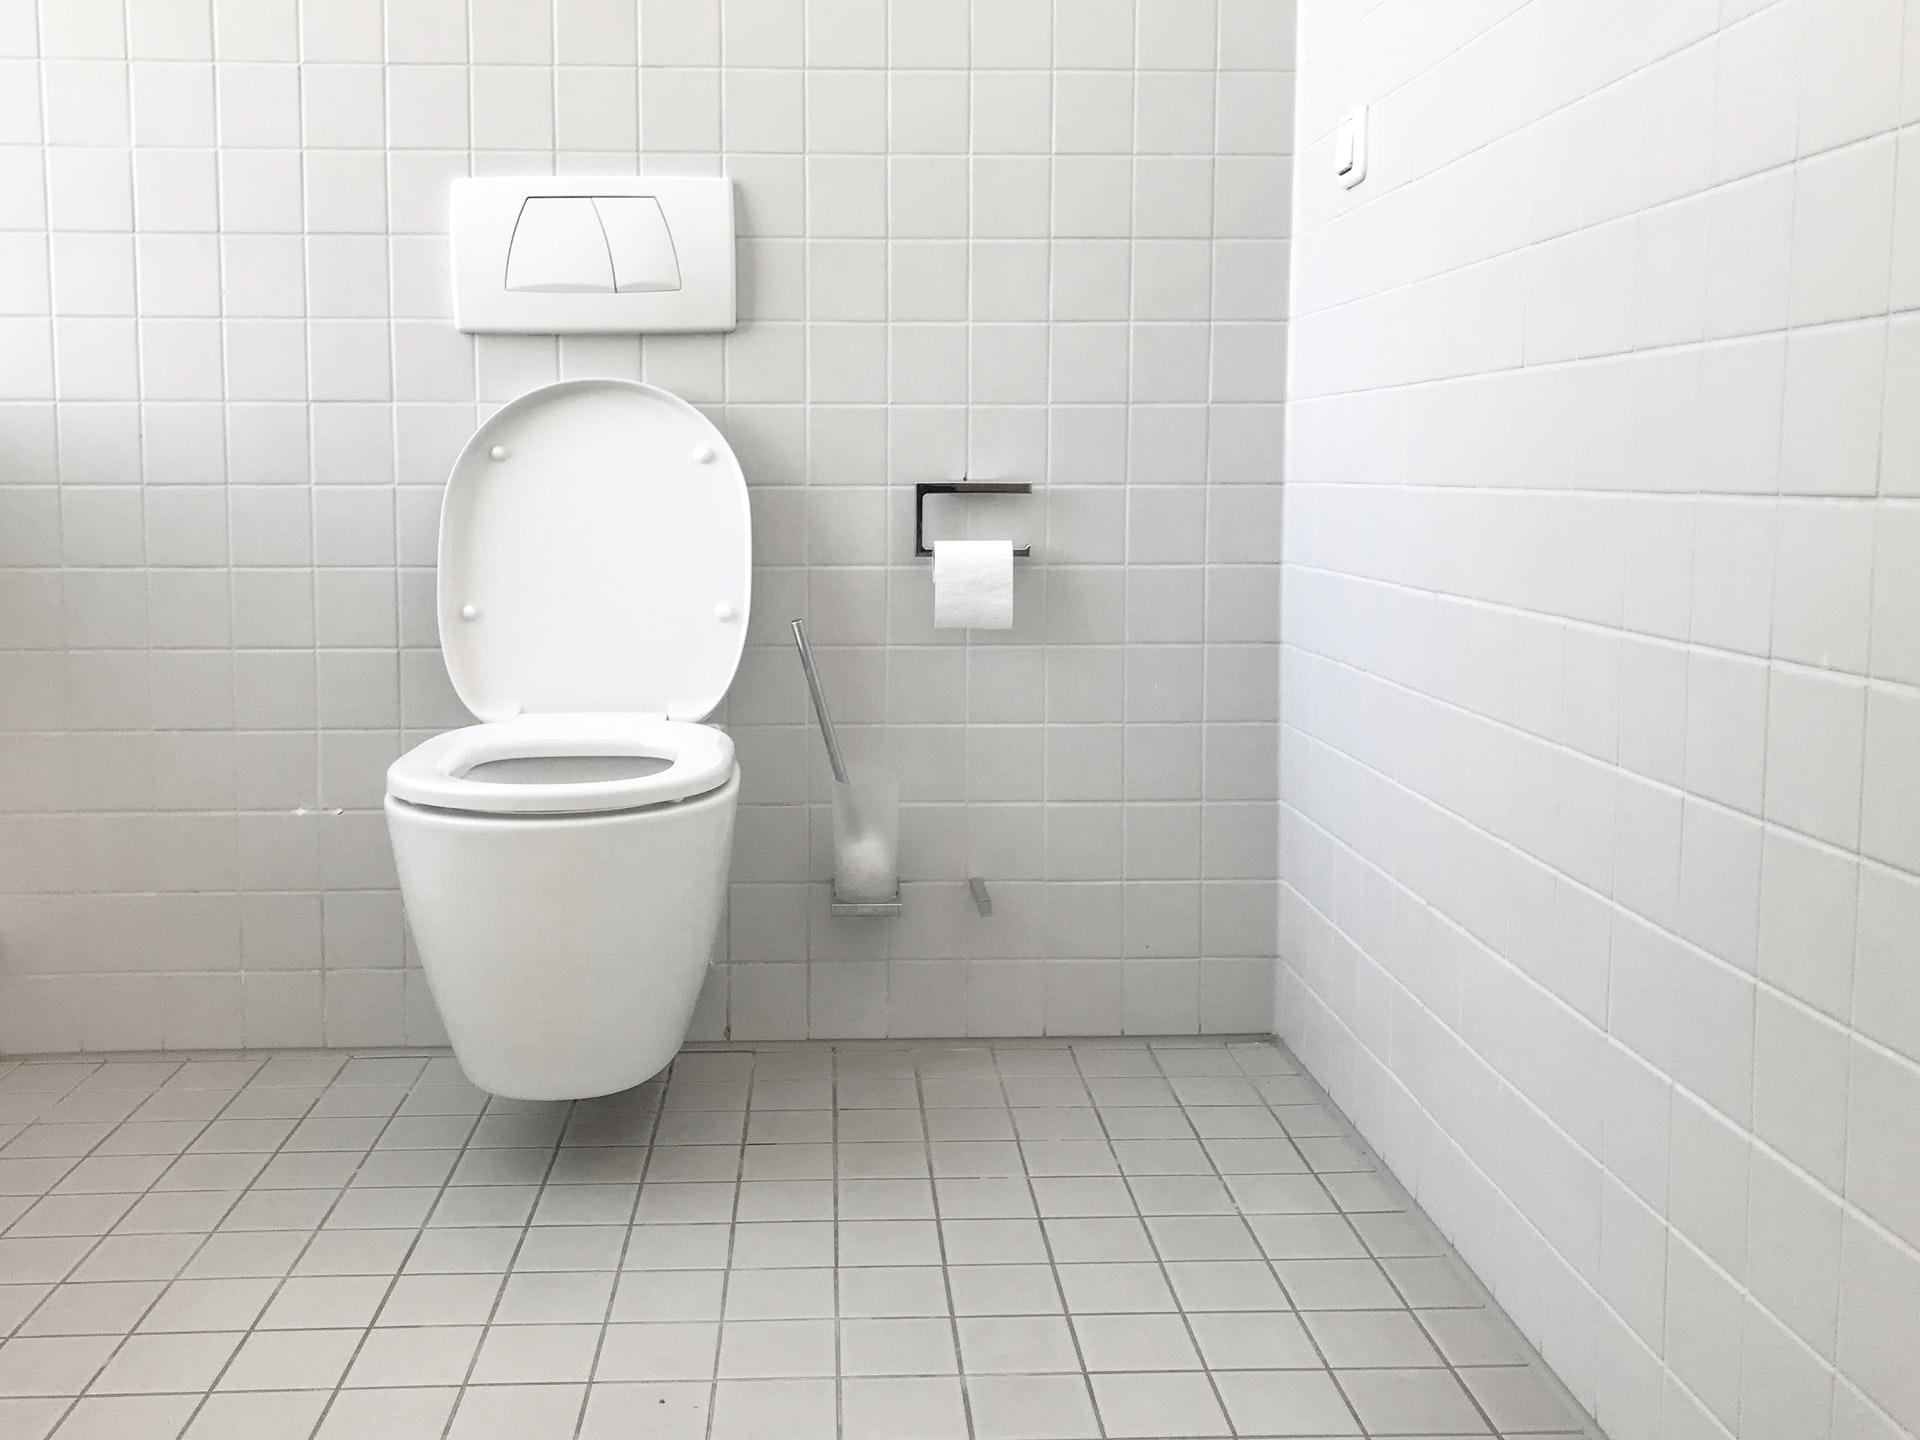 Toilet Gurgling